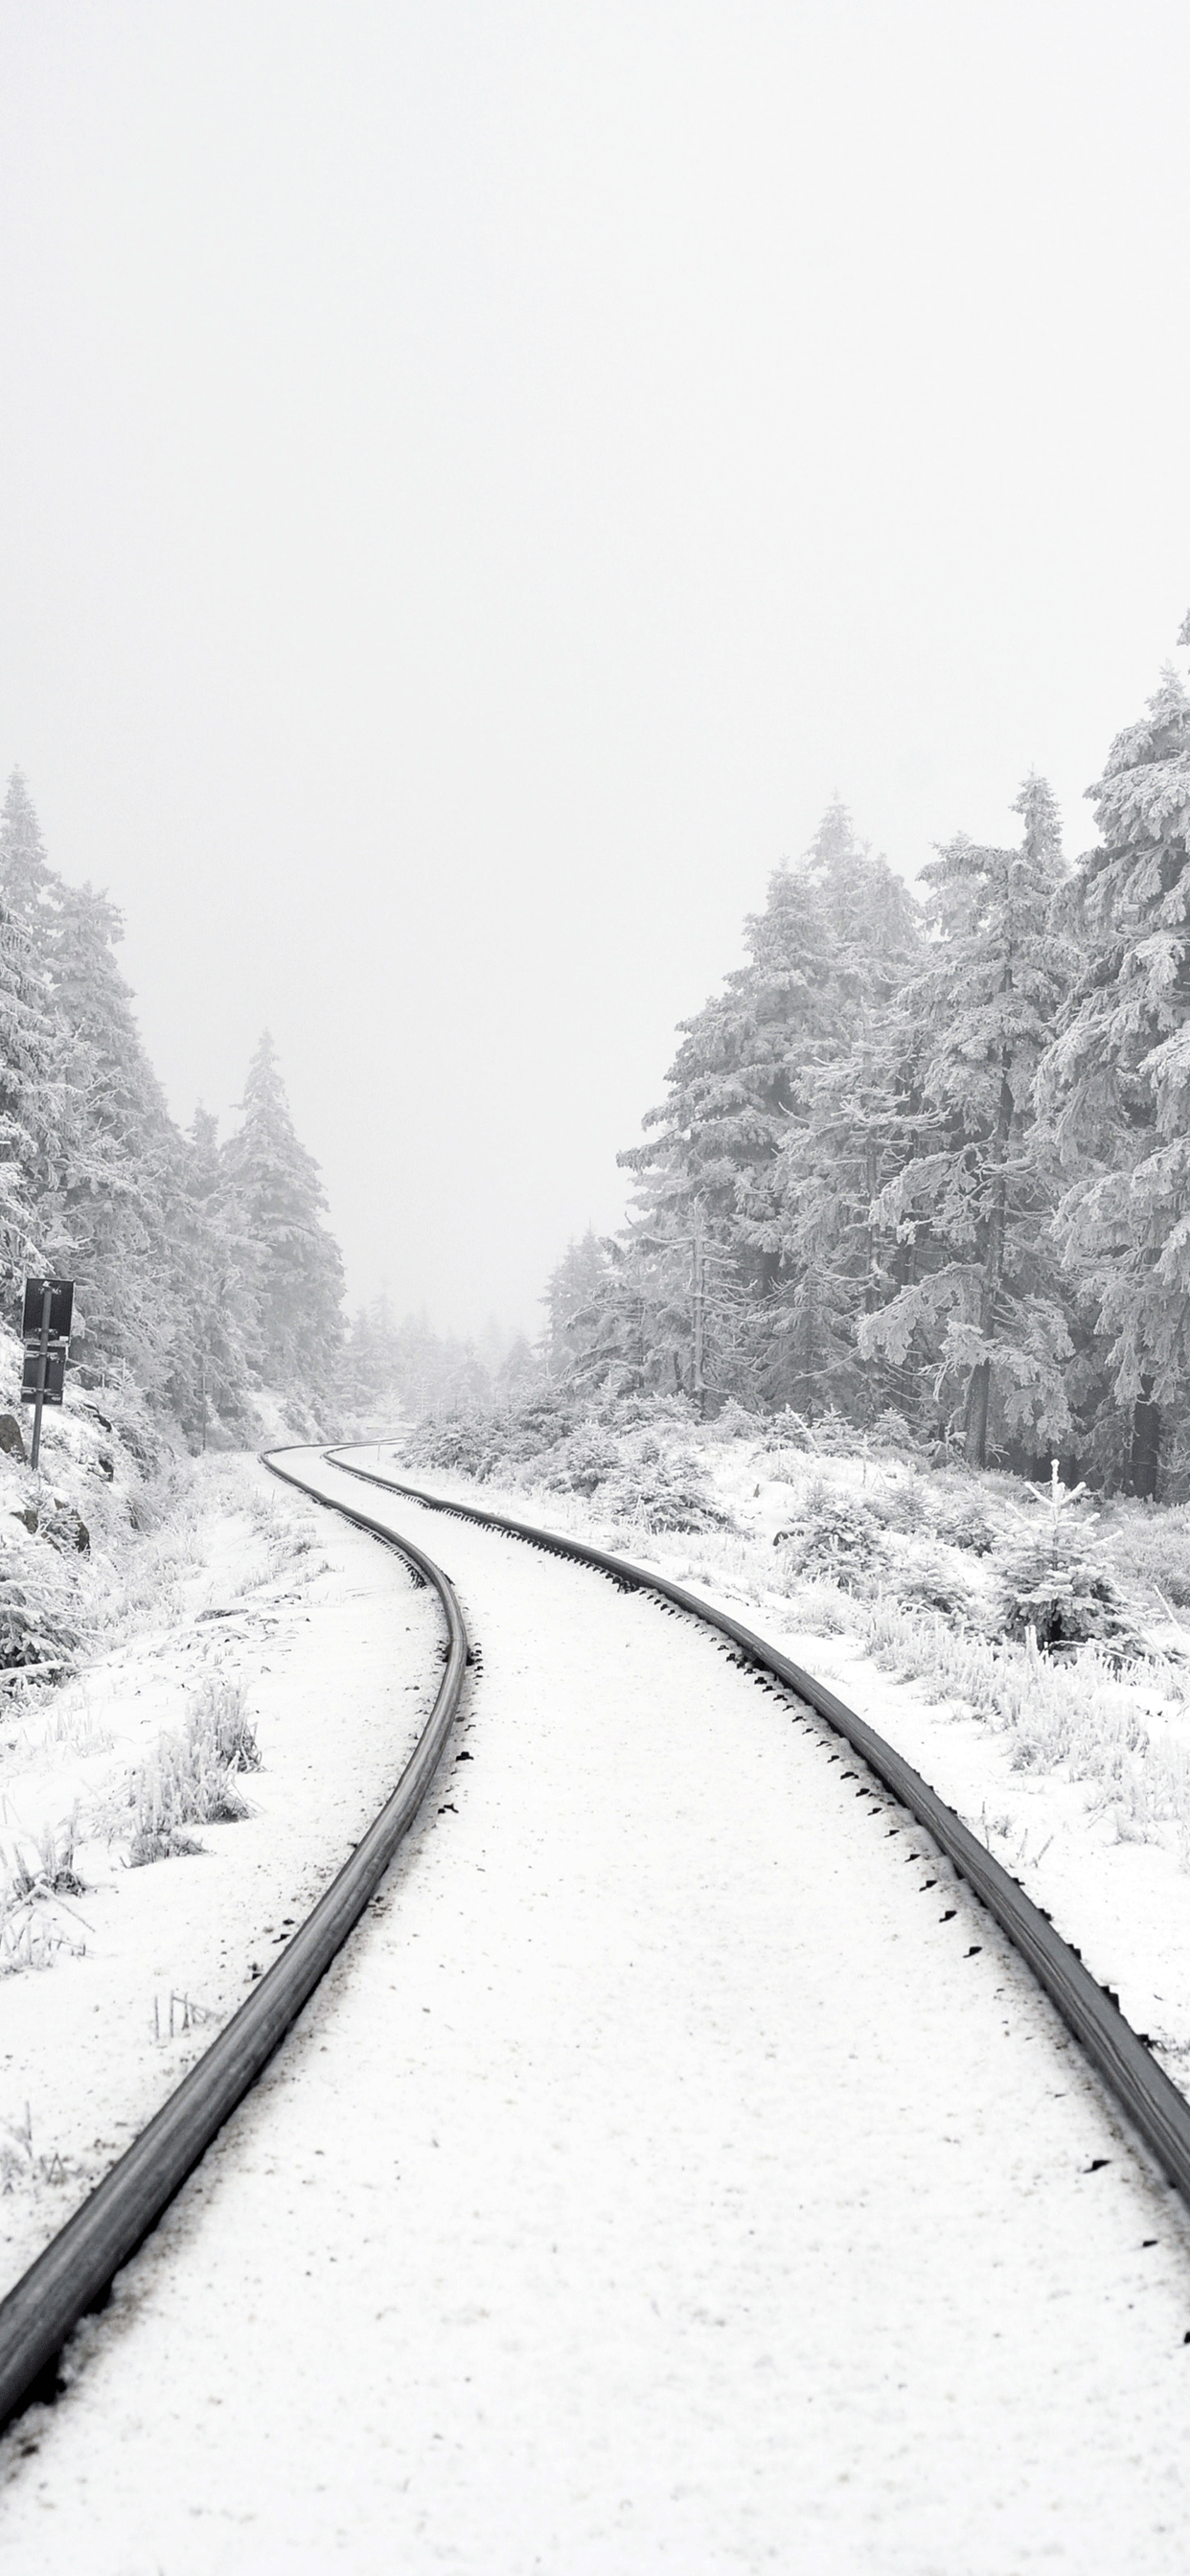 iPhone wallpaper rail way harz Railway line